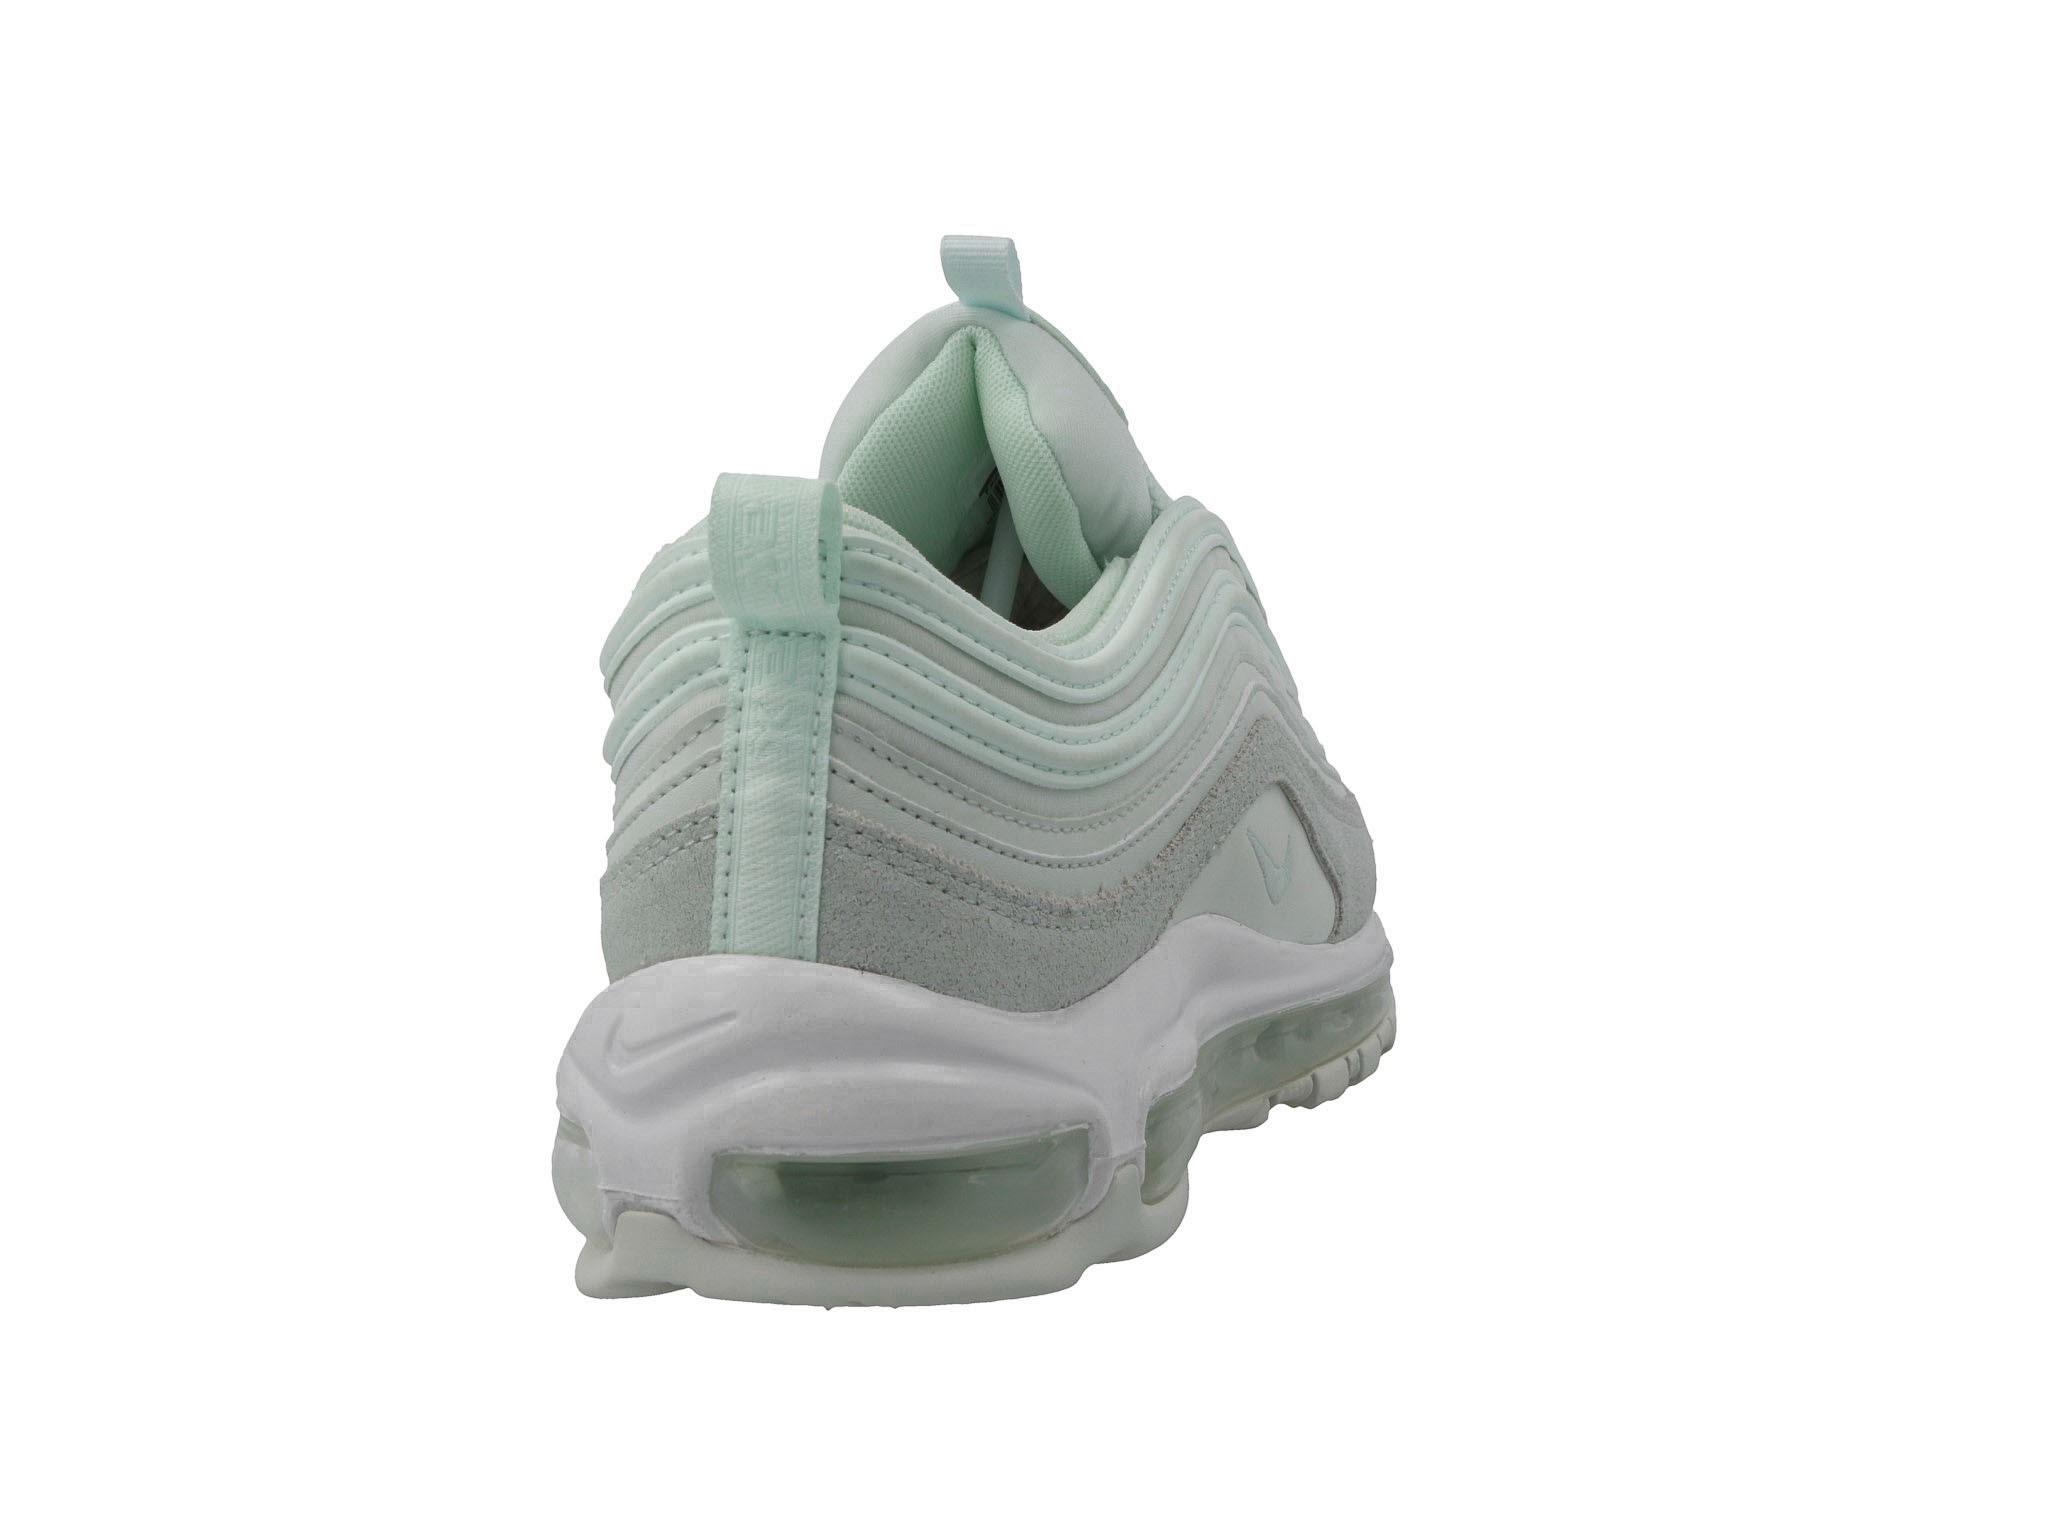 Nike W Air Max 97 PRM 917646 301